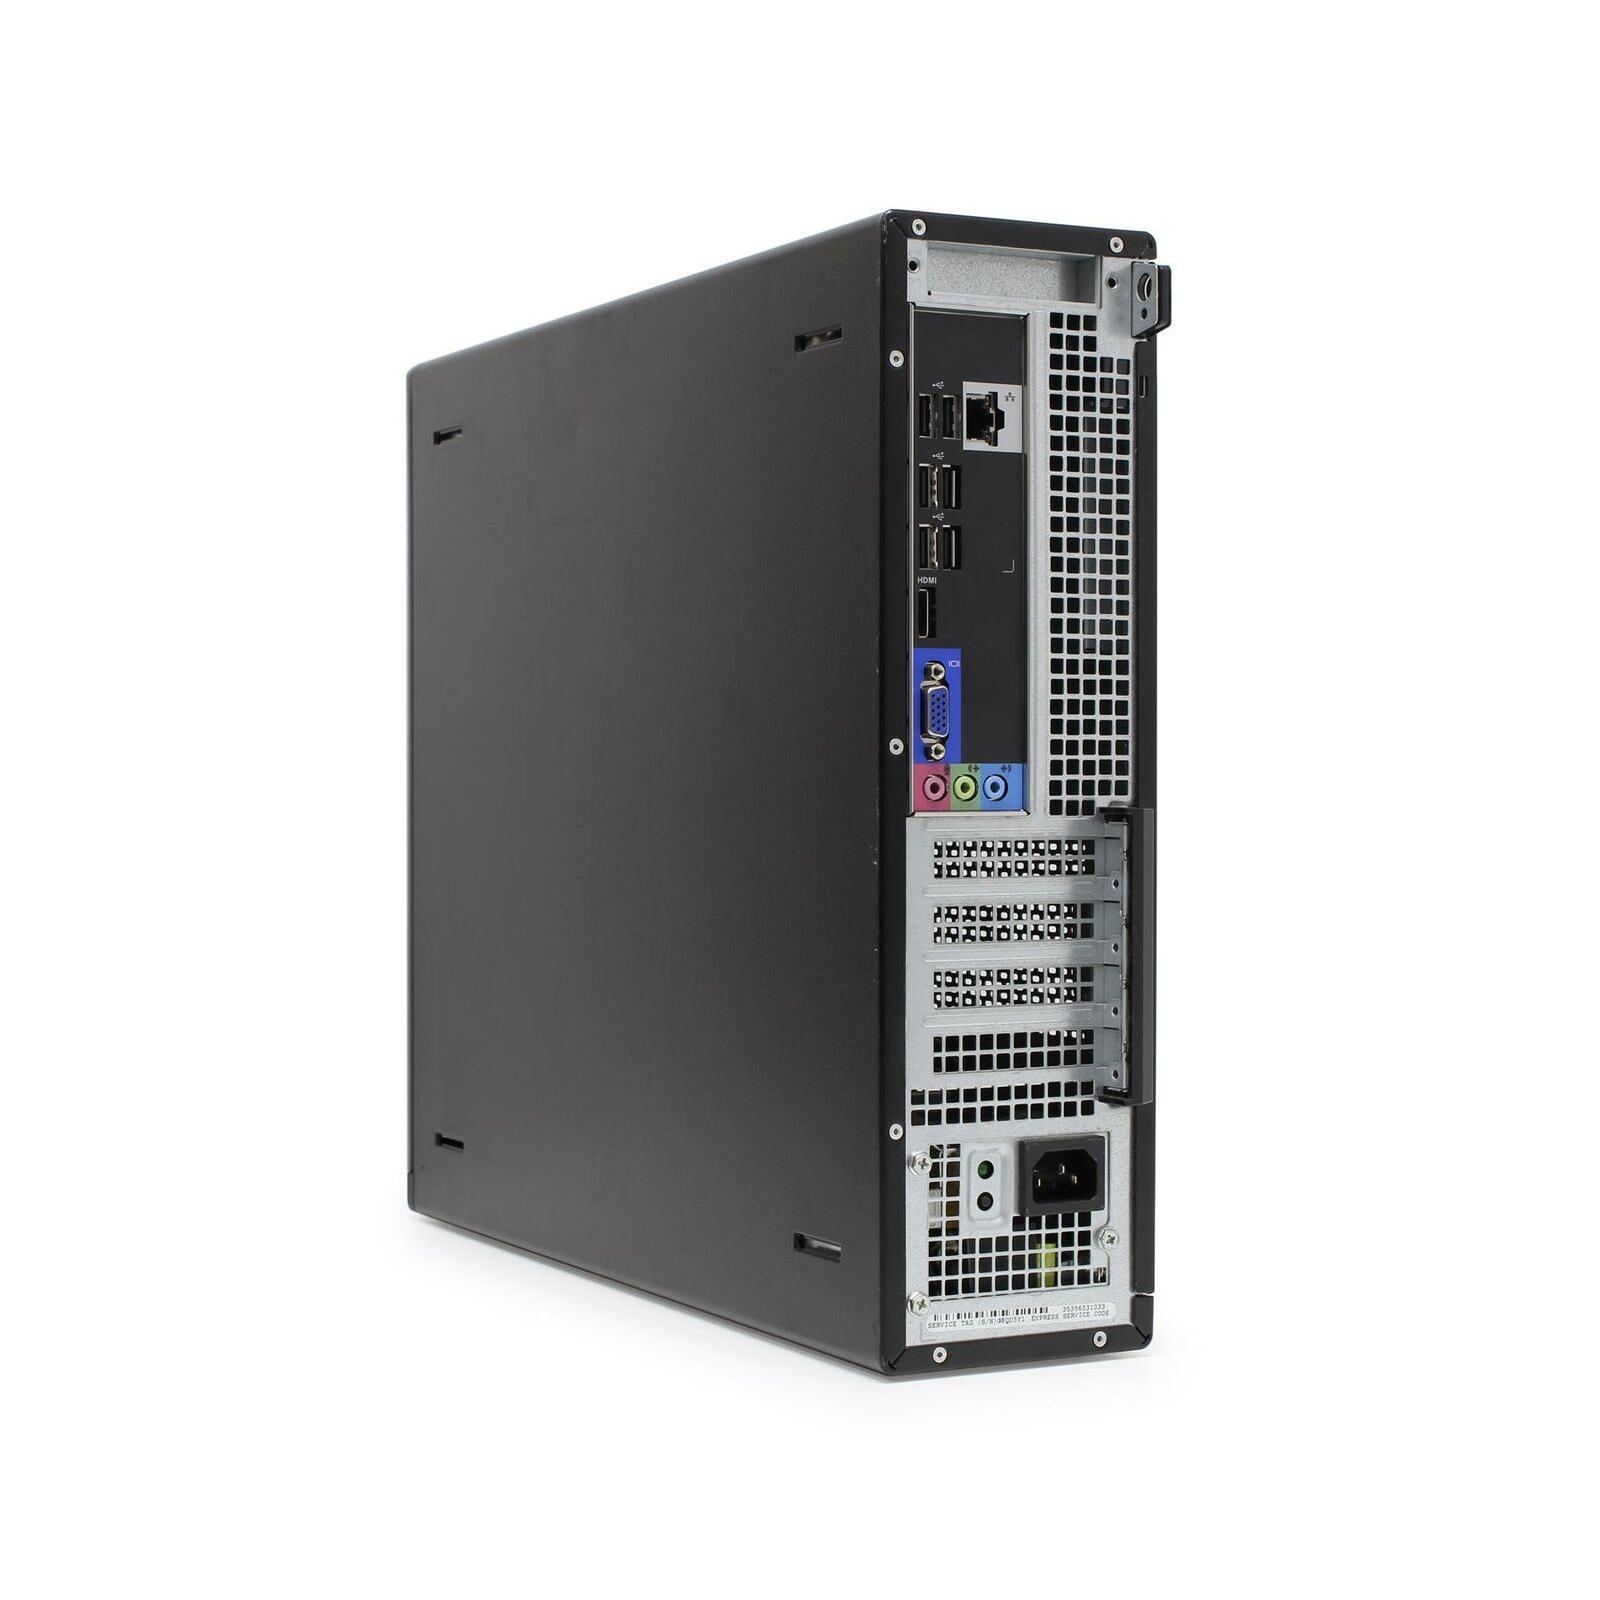 "Dell OptiPlex 3010 DT 19"" Pentium 2,8 GHz - SSD 240 GB - 8GB teclado"